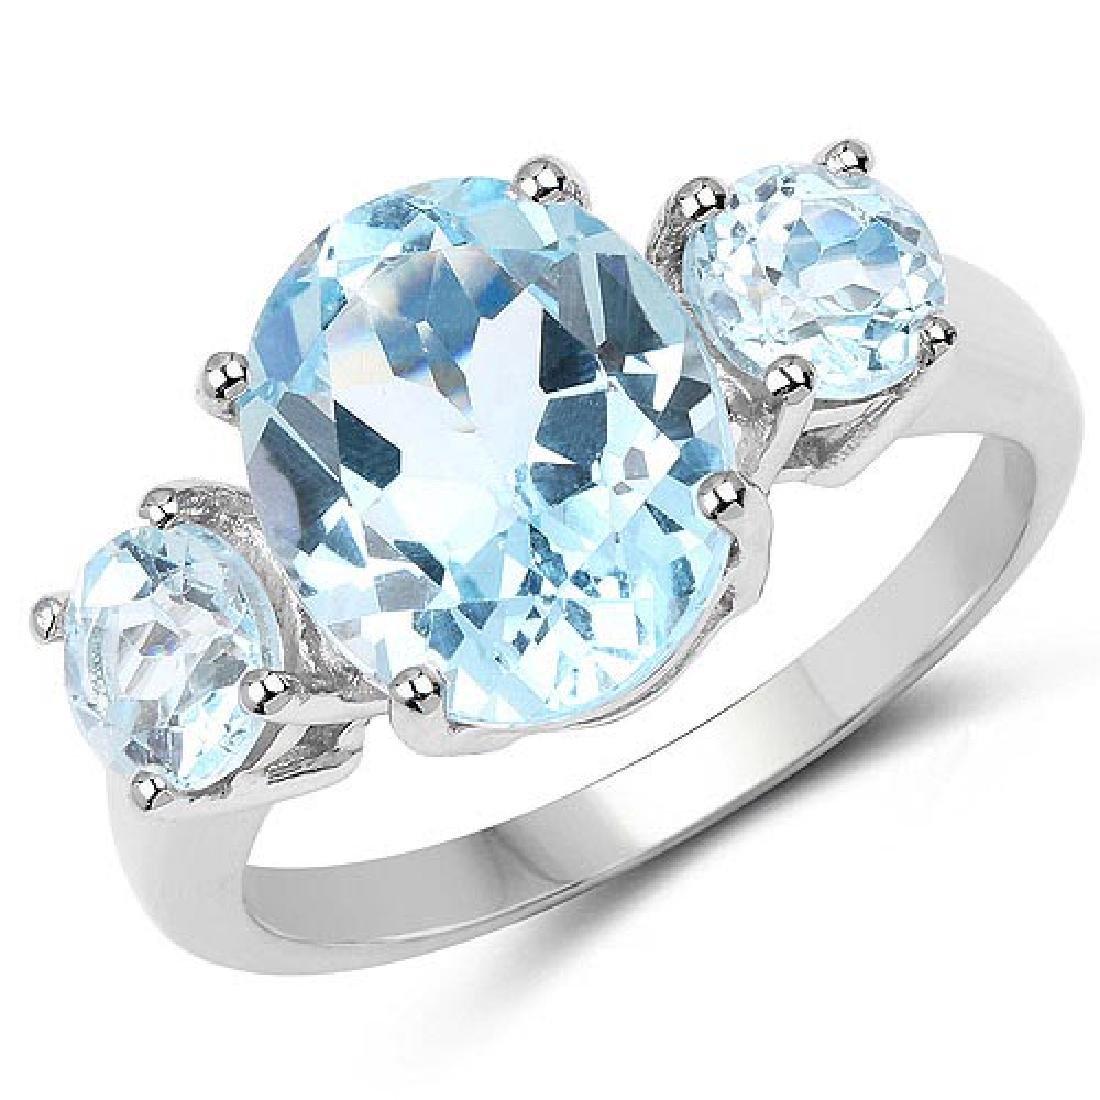 5.20 Carat Genuine Blue Topaz .925 Sterling Silver Ring